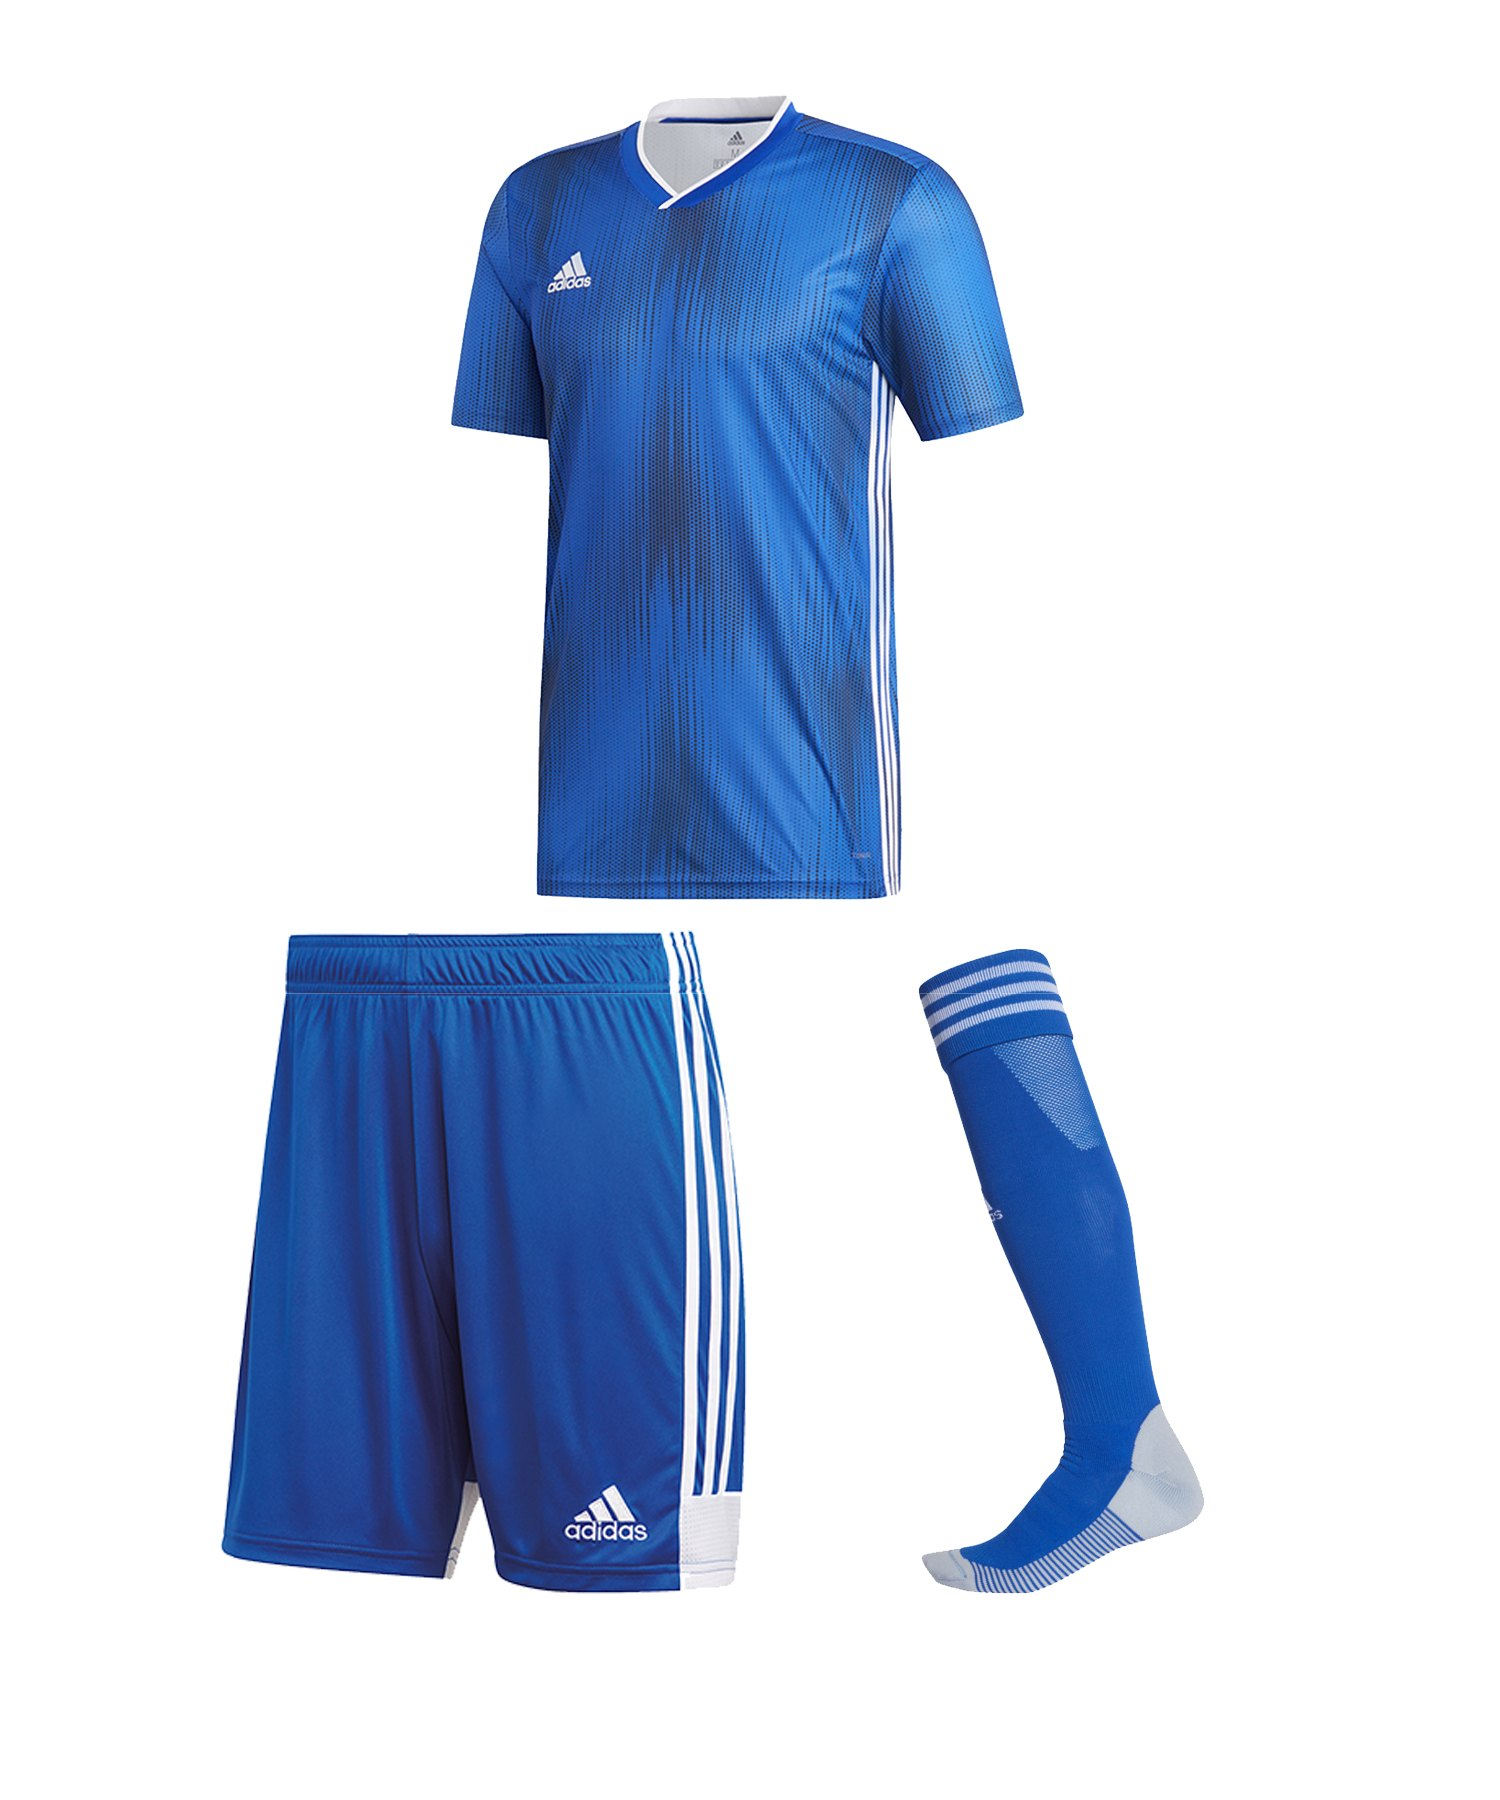 adidas Tiro 19 Trikotset kurzarm Blau Weiss - blau